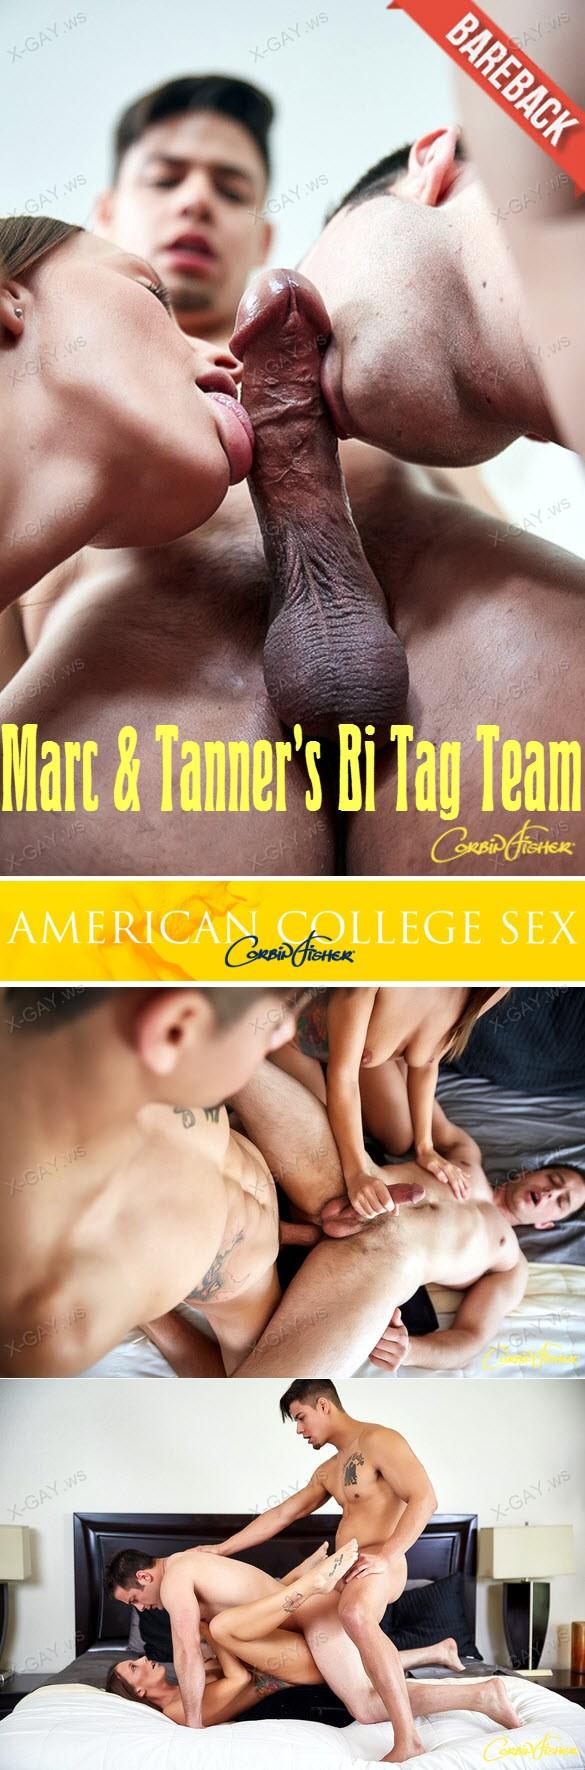 CorbinFisher – Marc & Tanner's Bi Tag Team, Bareback